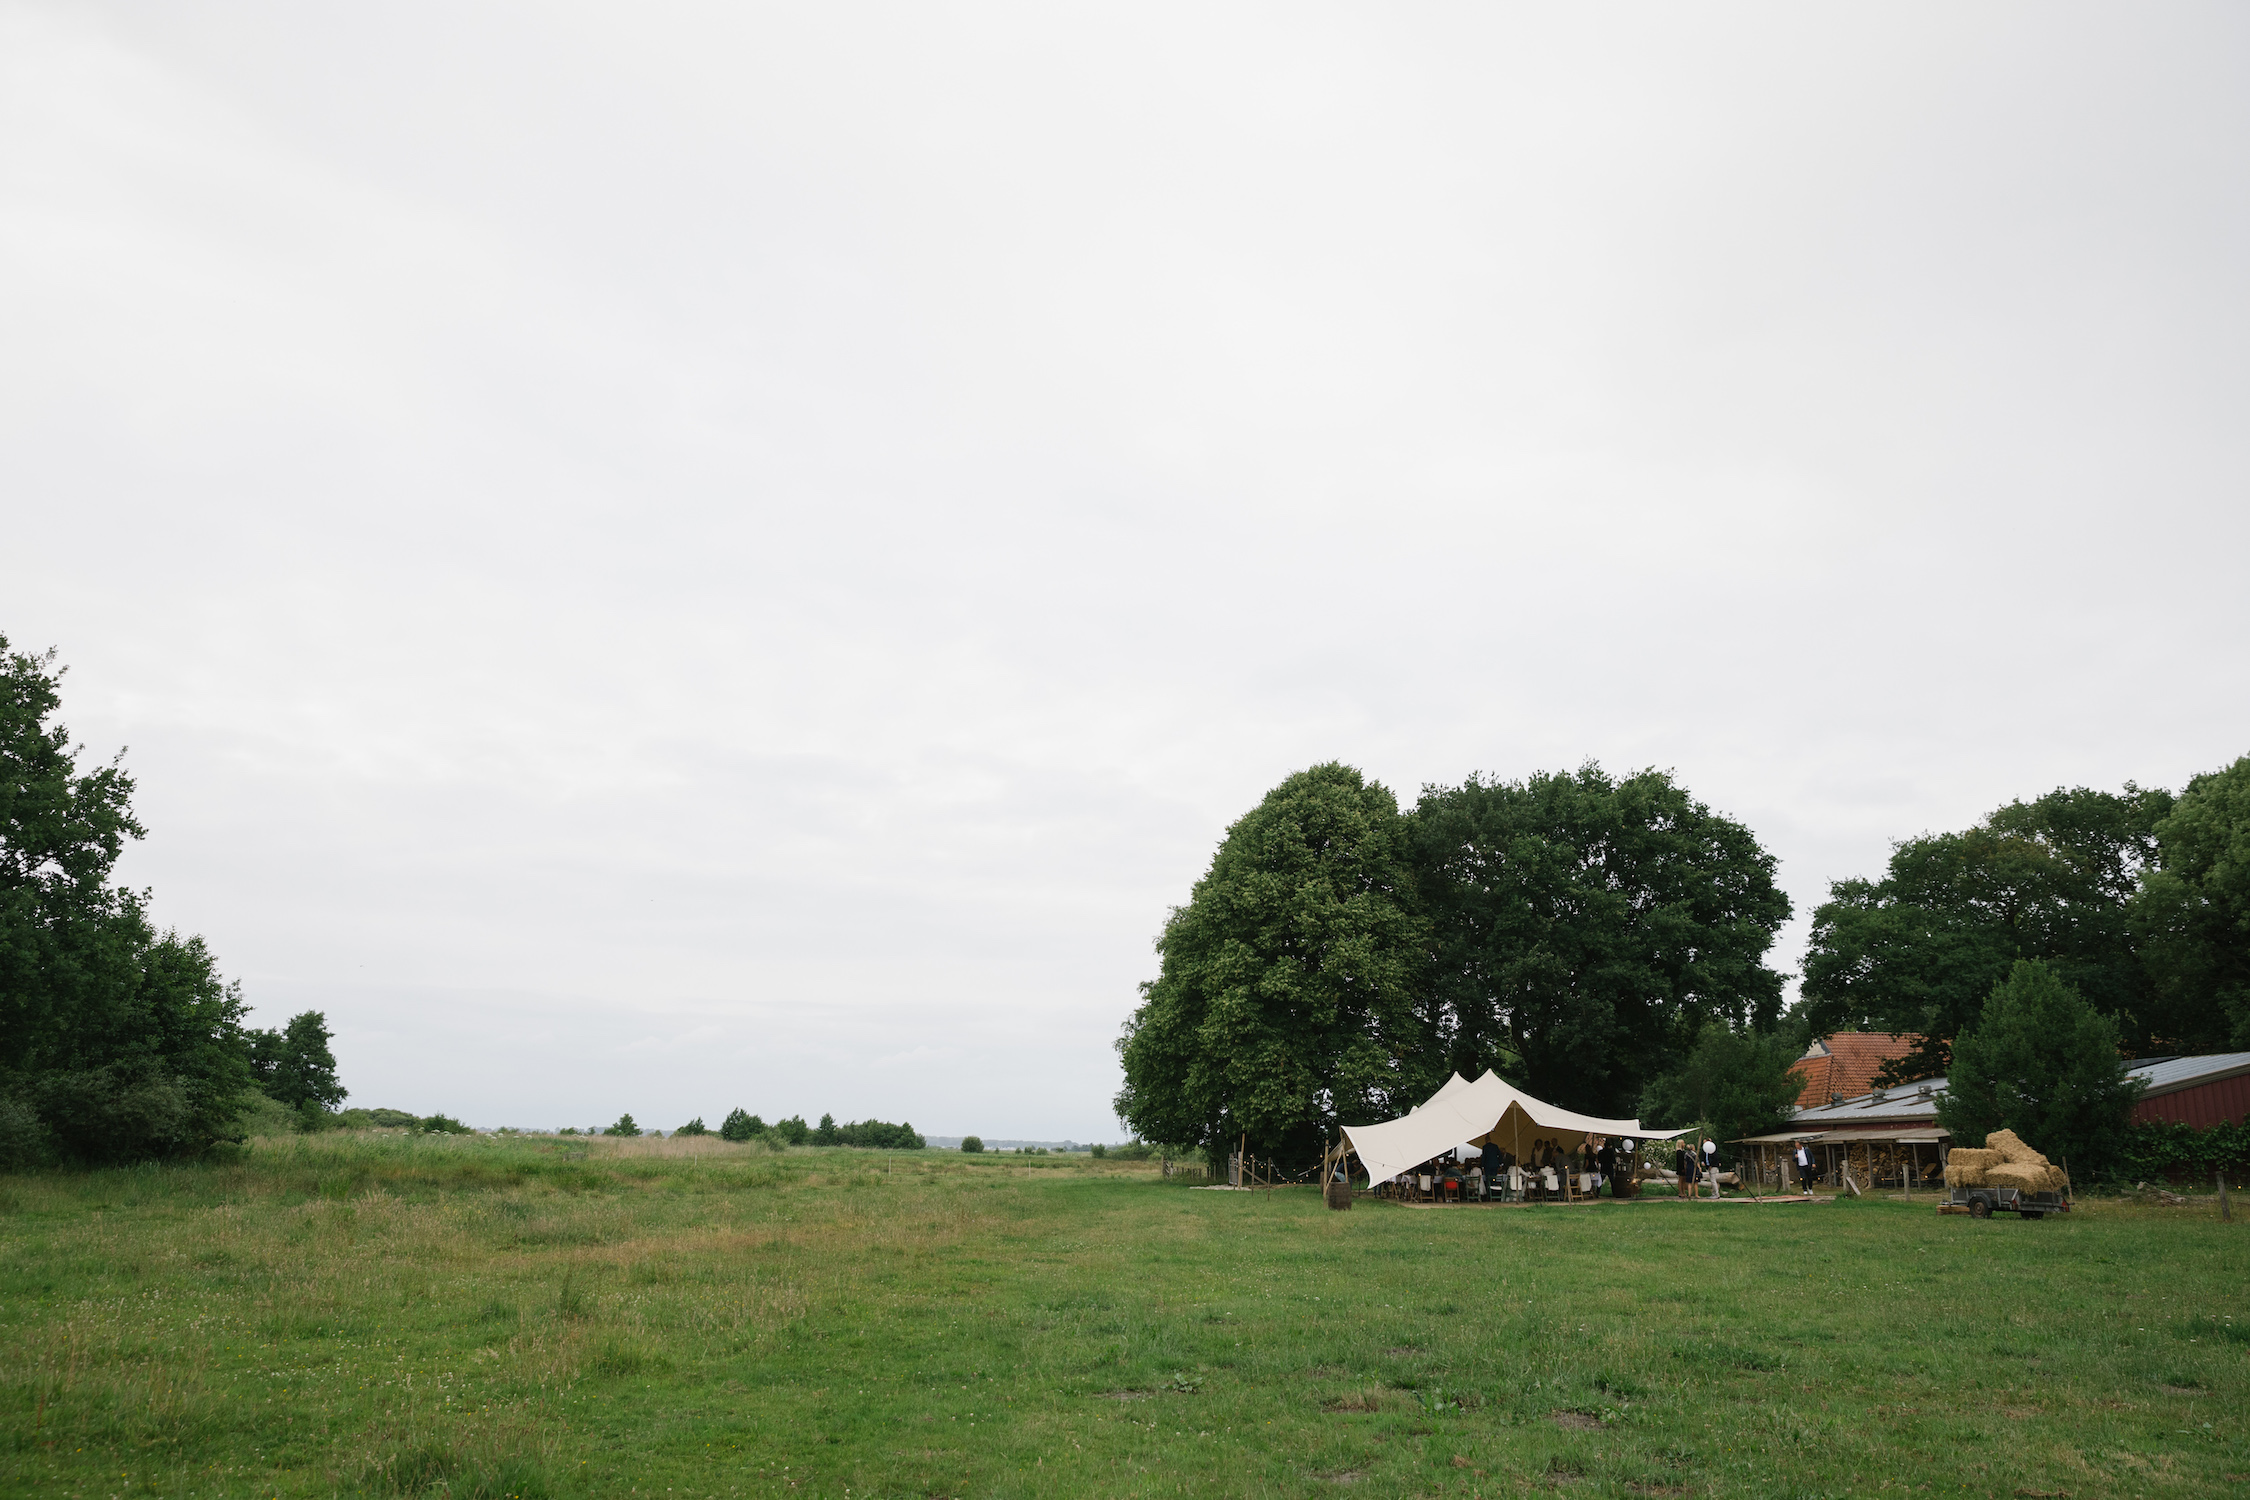 weiland bruiloft trouwen tent